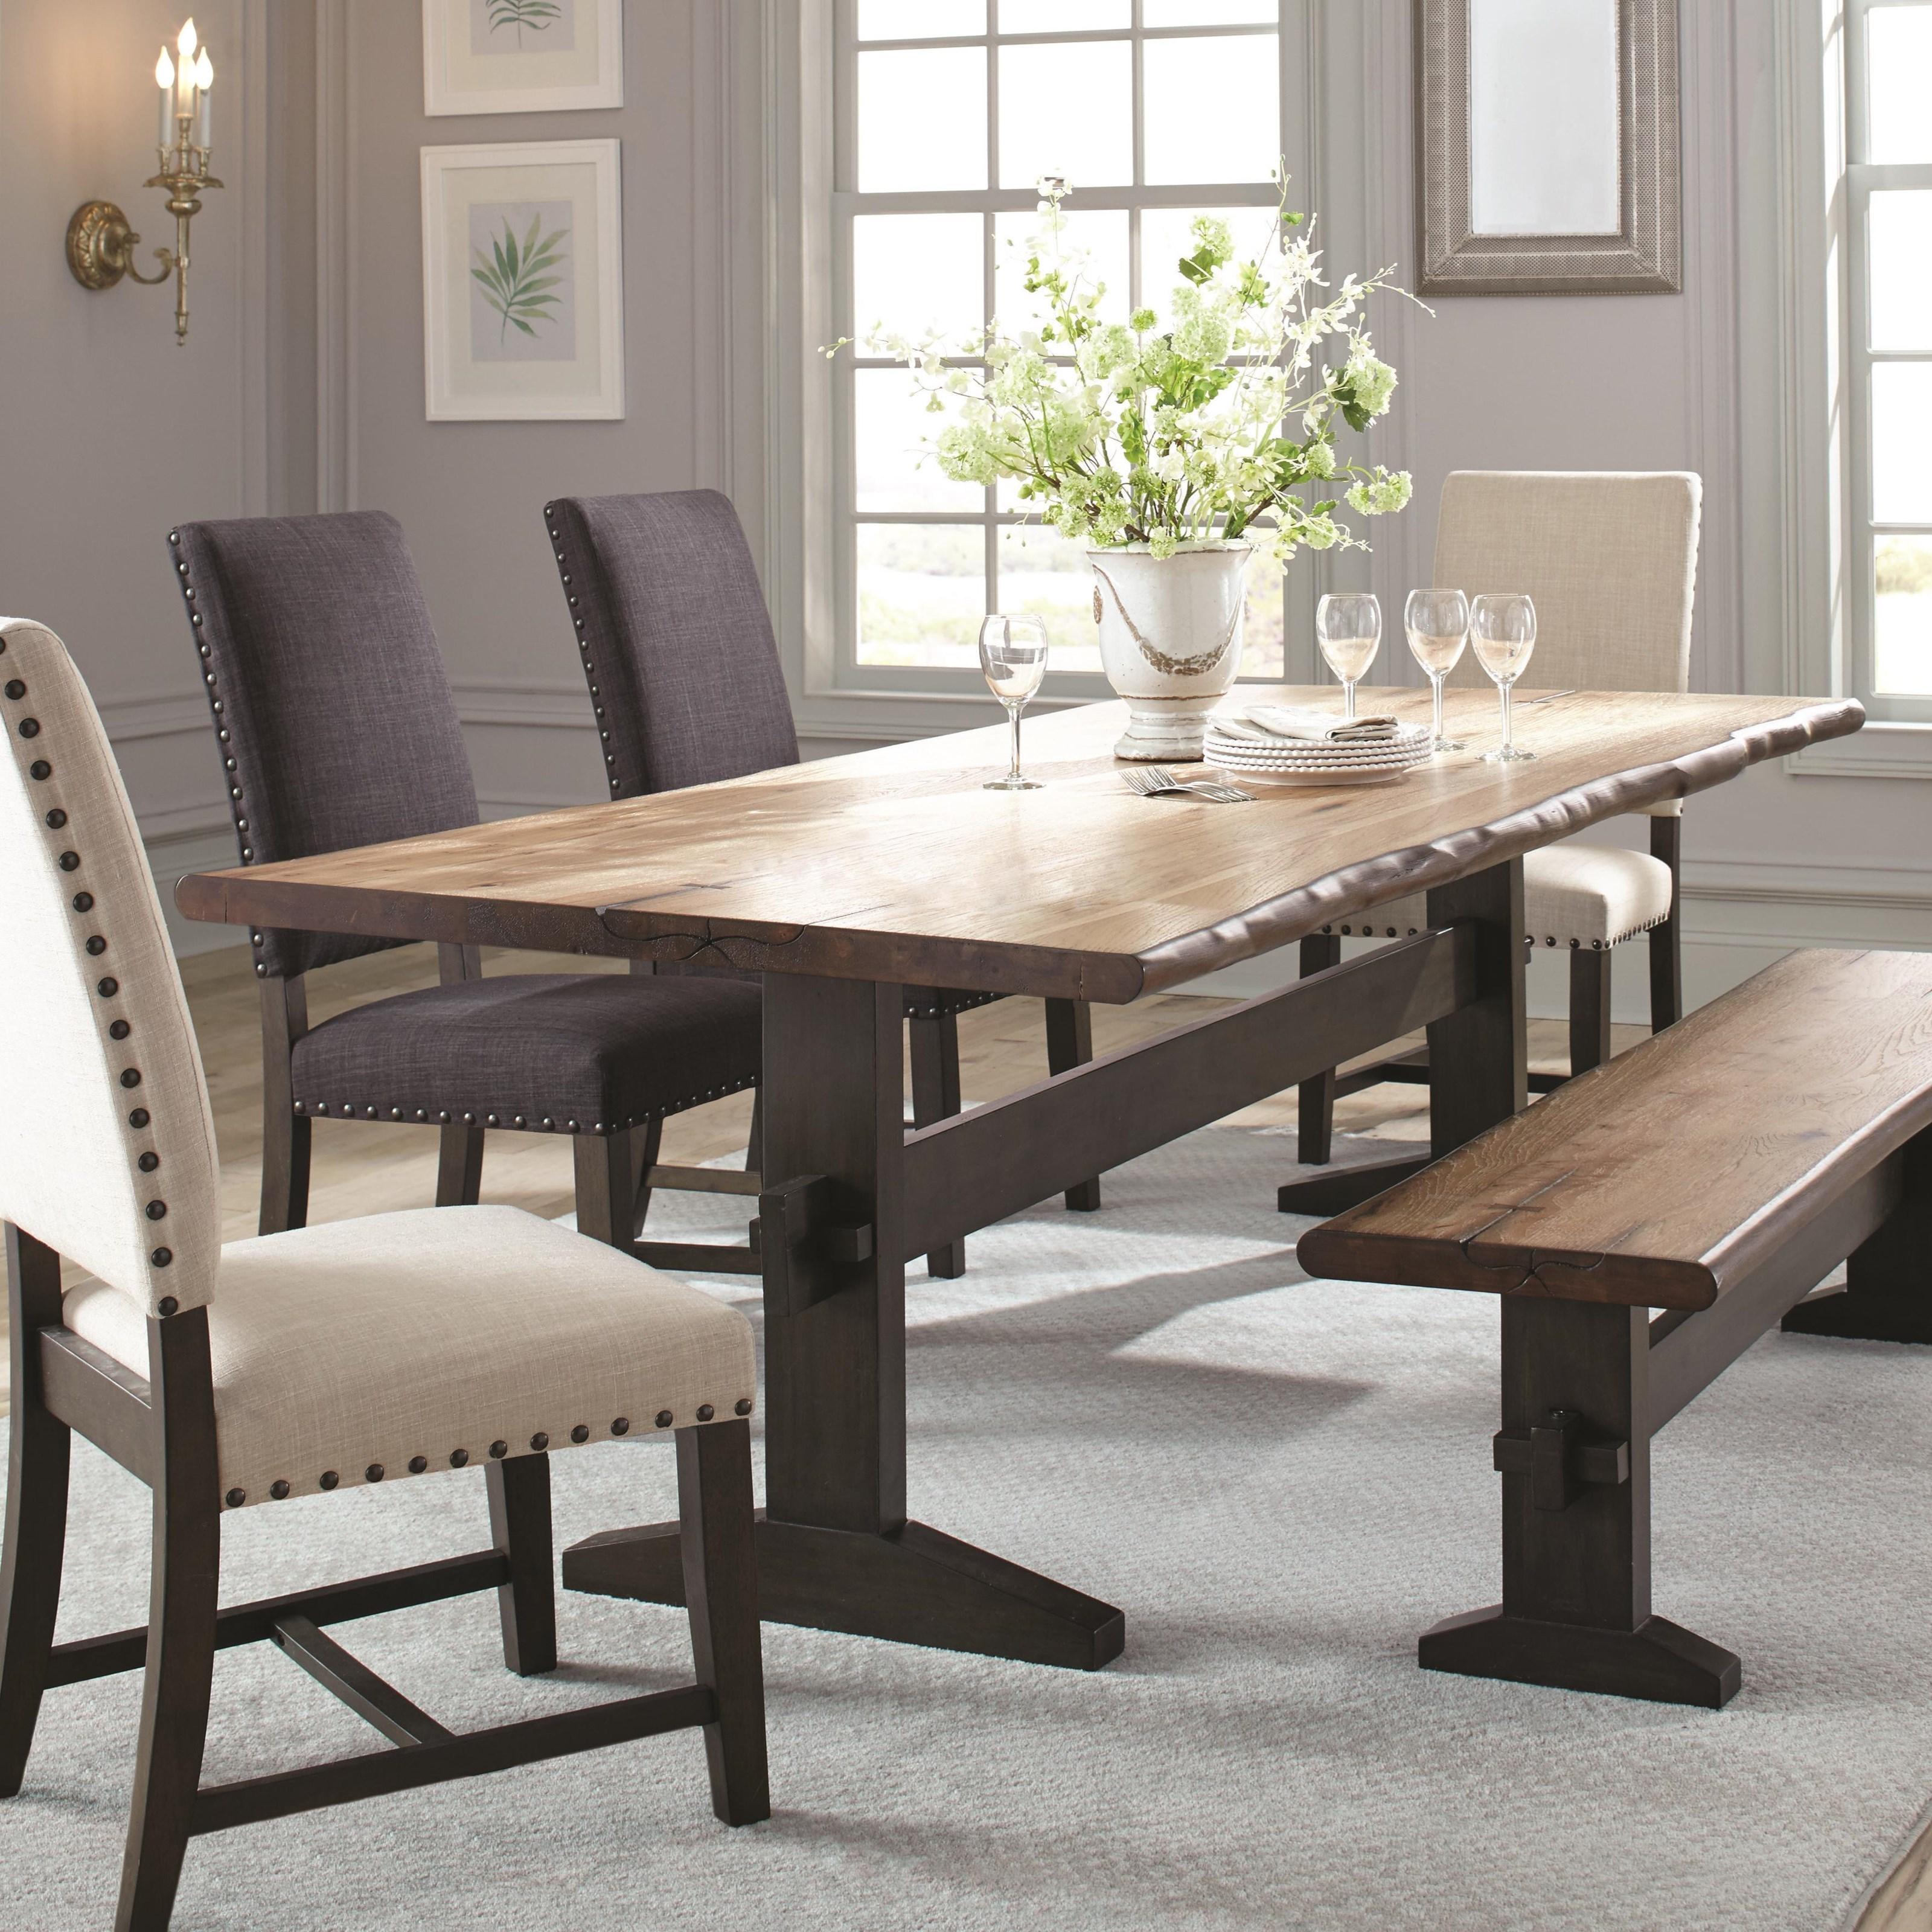 Astounding Burnham Two Tone Live Edge Dining Table With Trestle Base Interior Design Ideas Oxytryabchikinfo